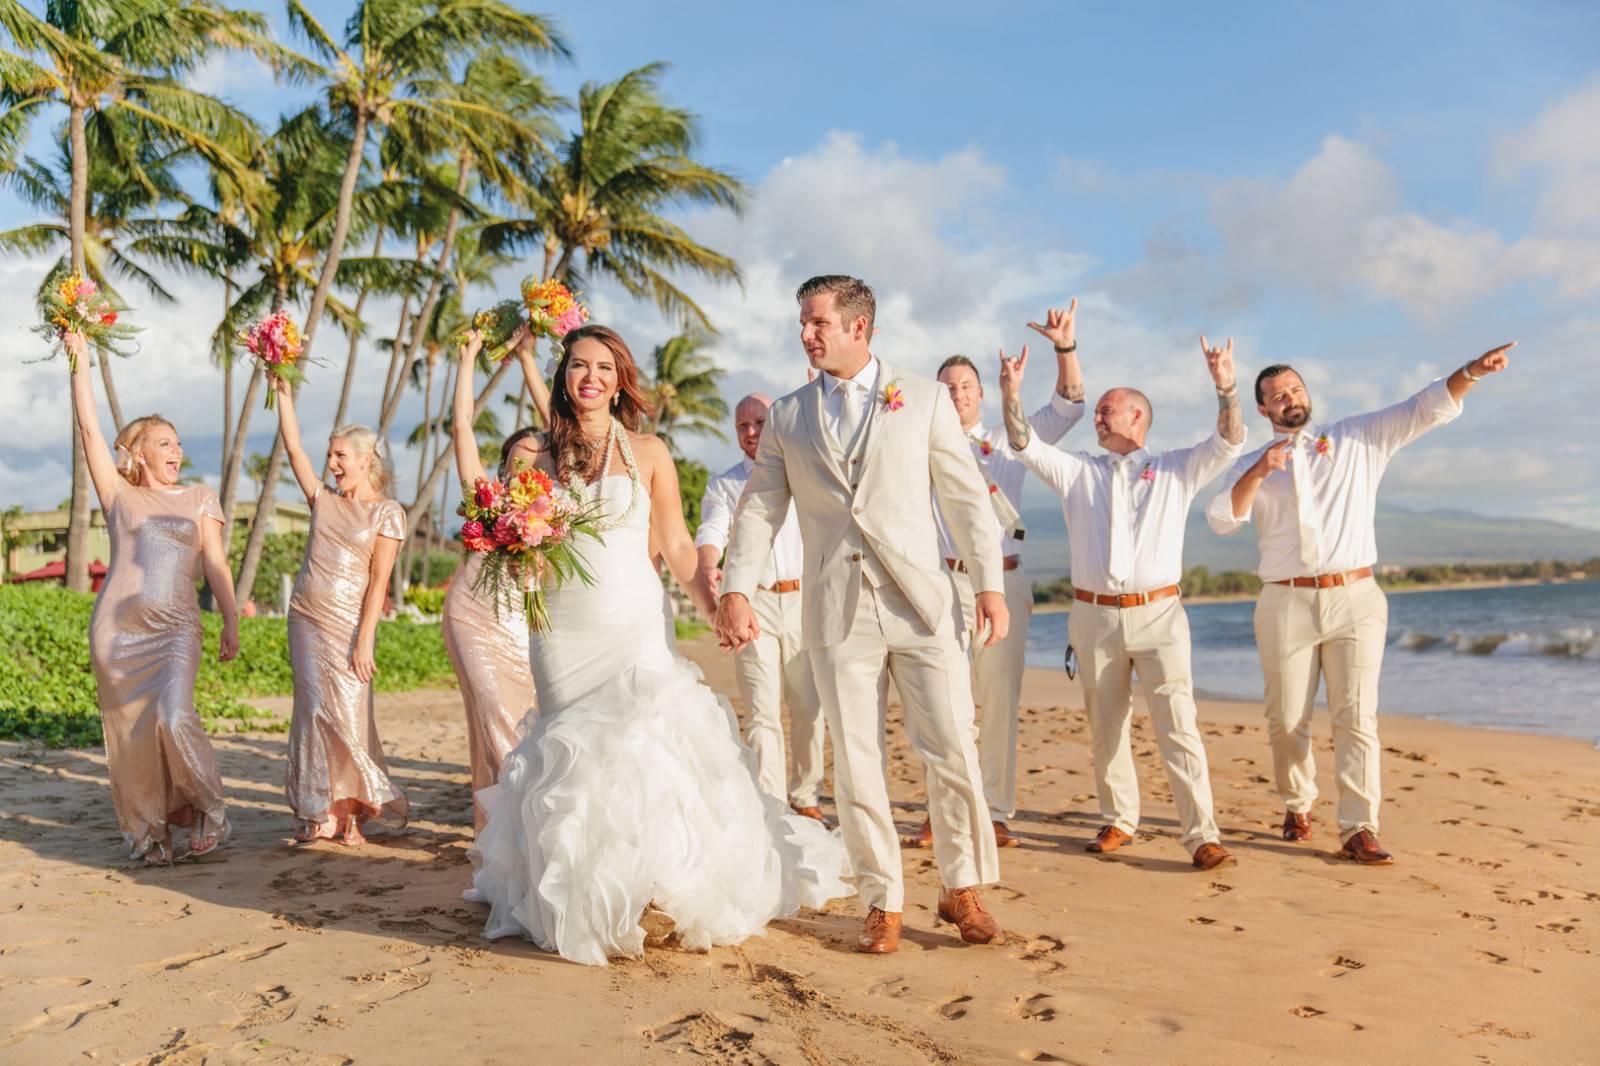 A Fabulous Destination Wedding In Paradise